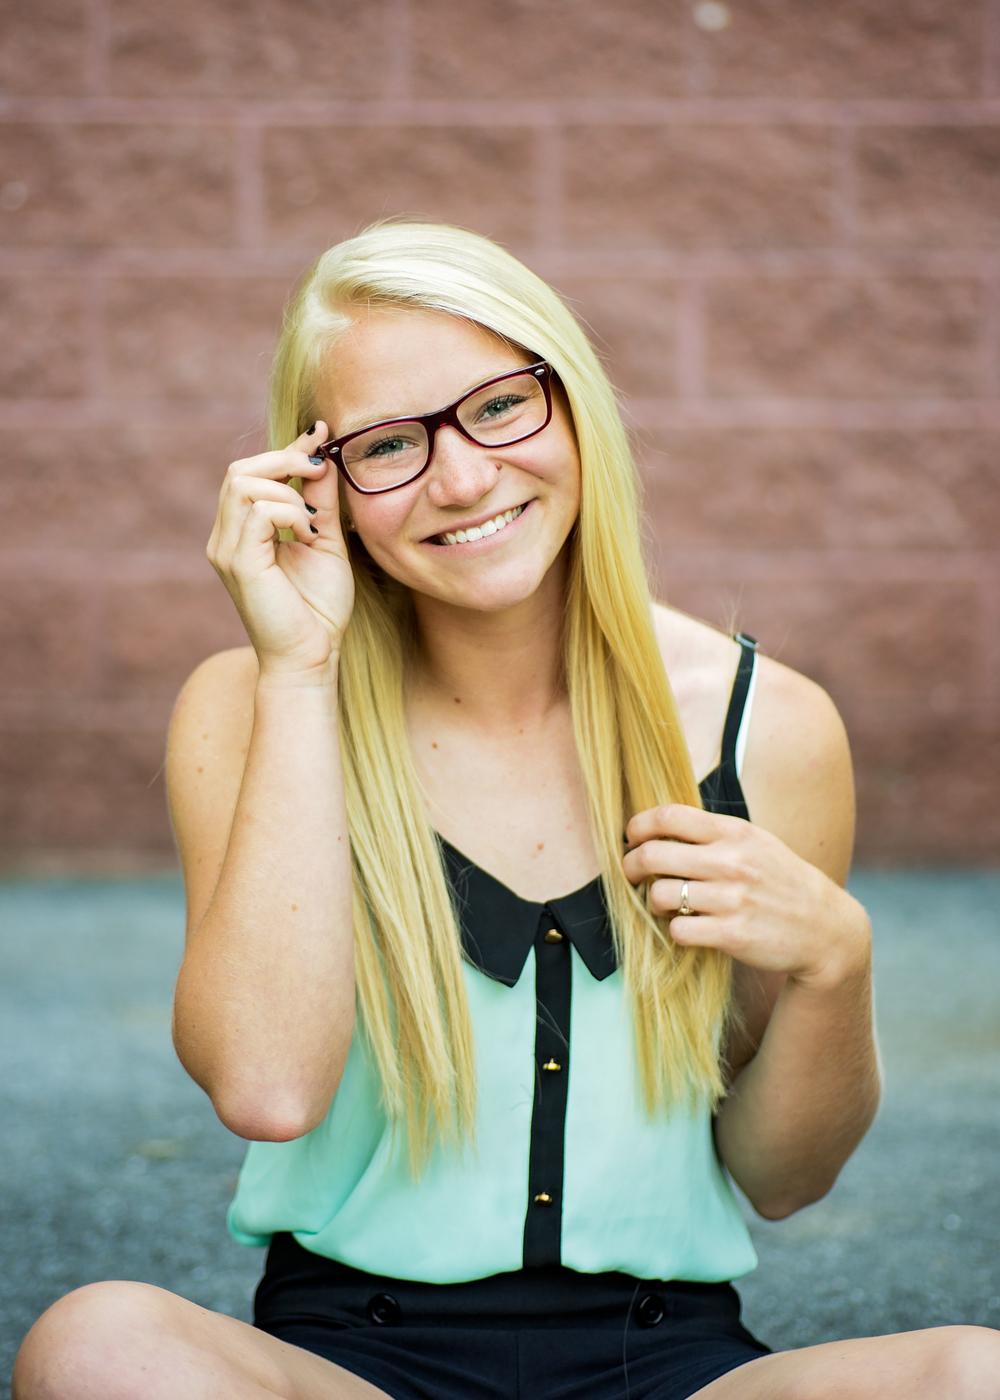 high-school-senior-glasses-quirky